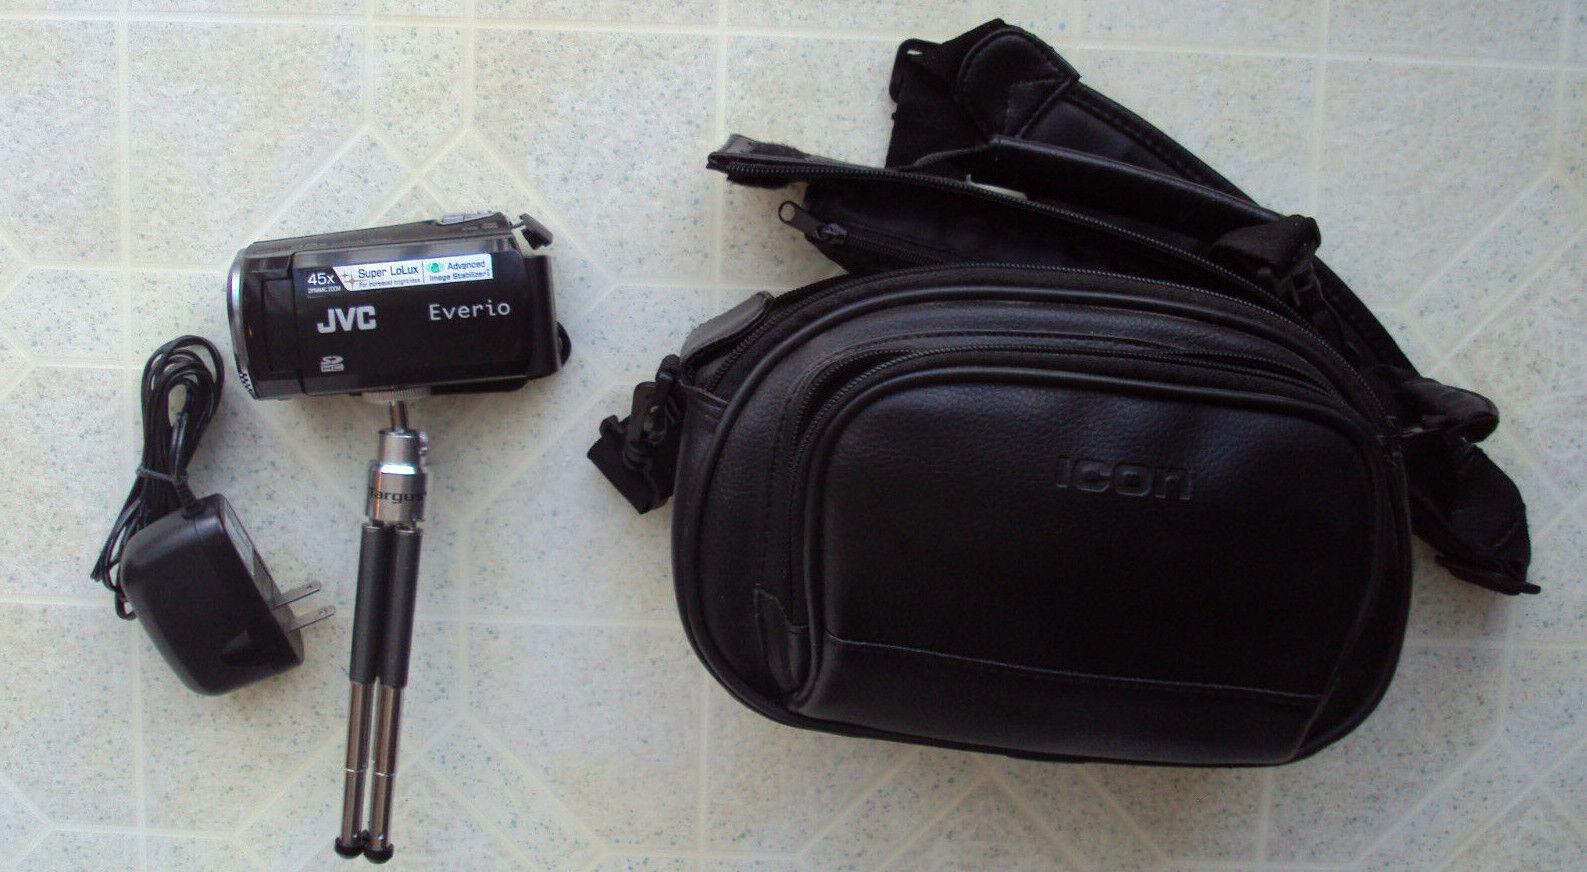 s l1600 - JVC Everio GZ-MS110BU Camcorder 45X Dynamic Zoom